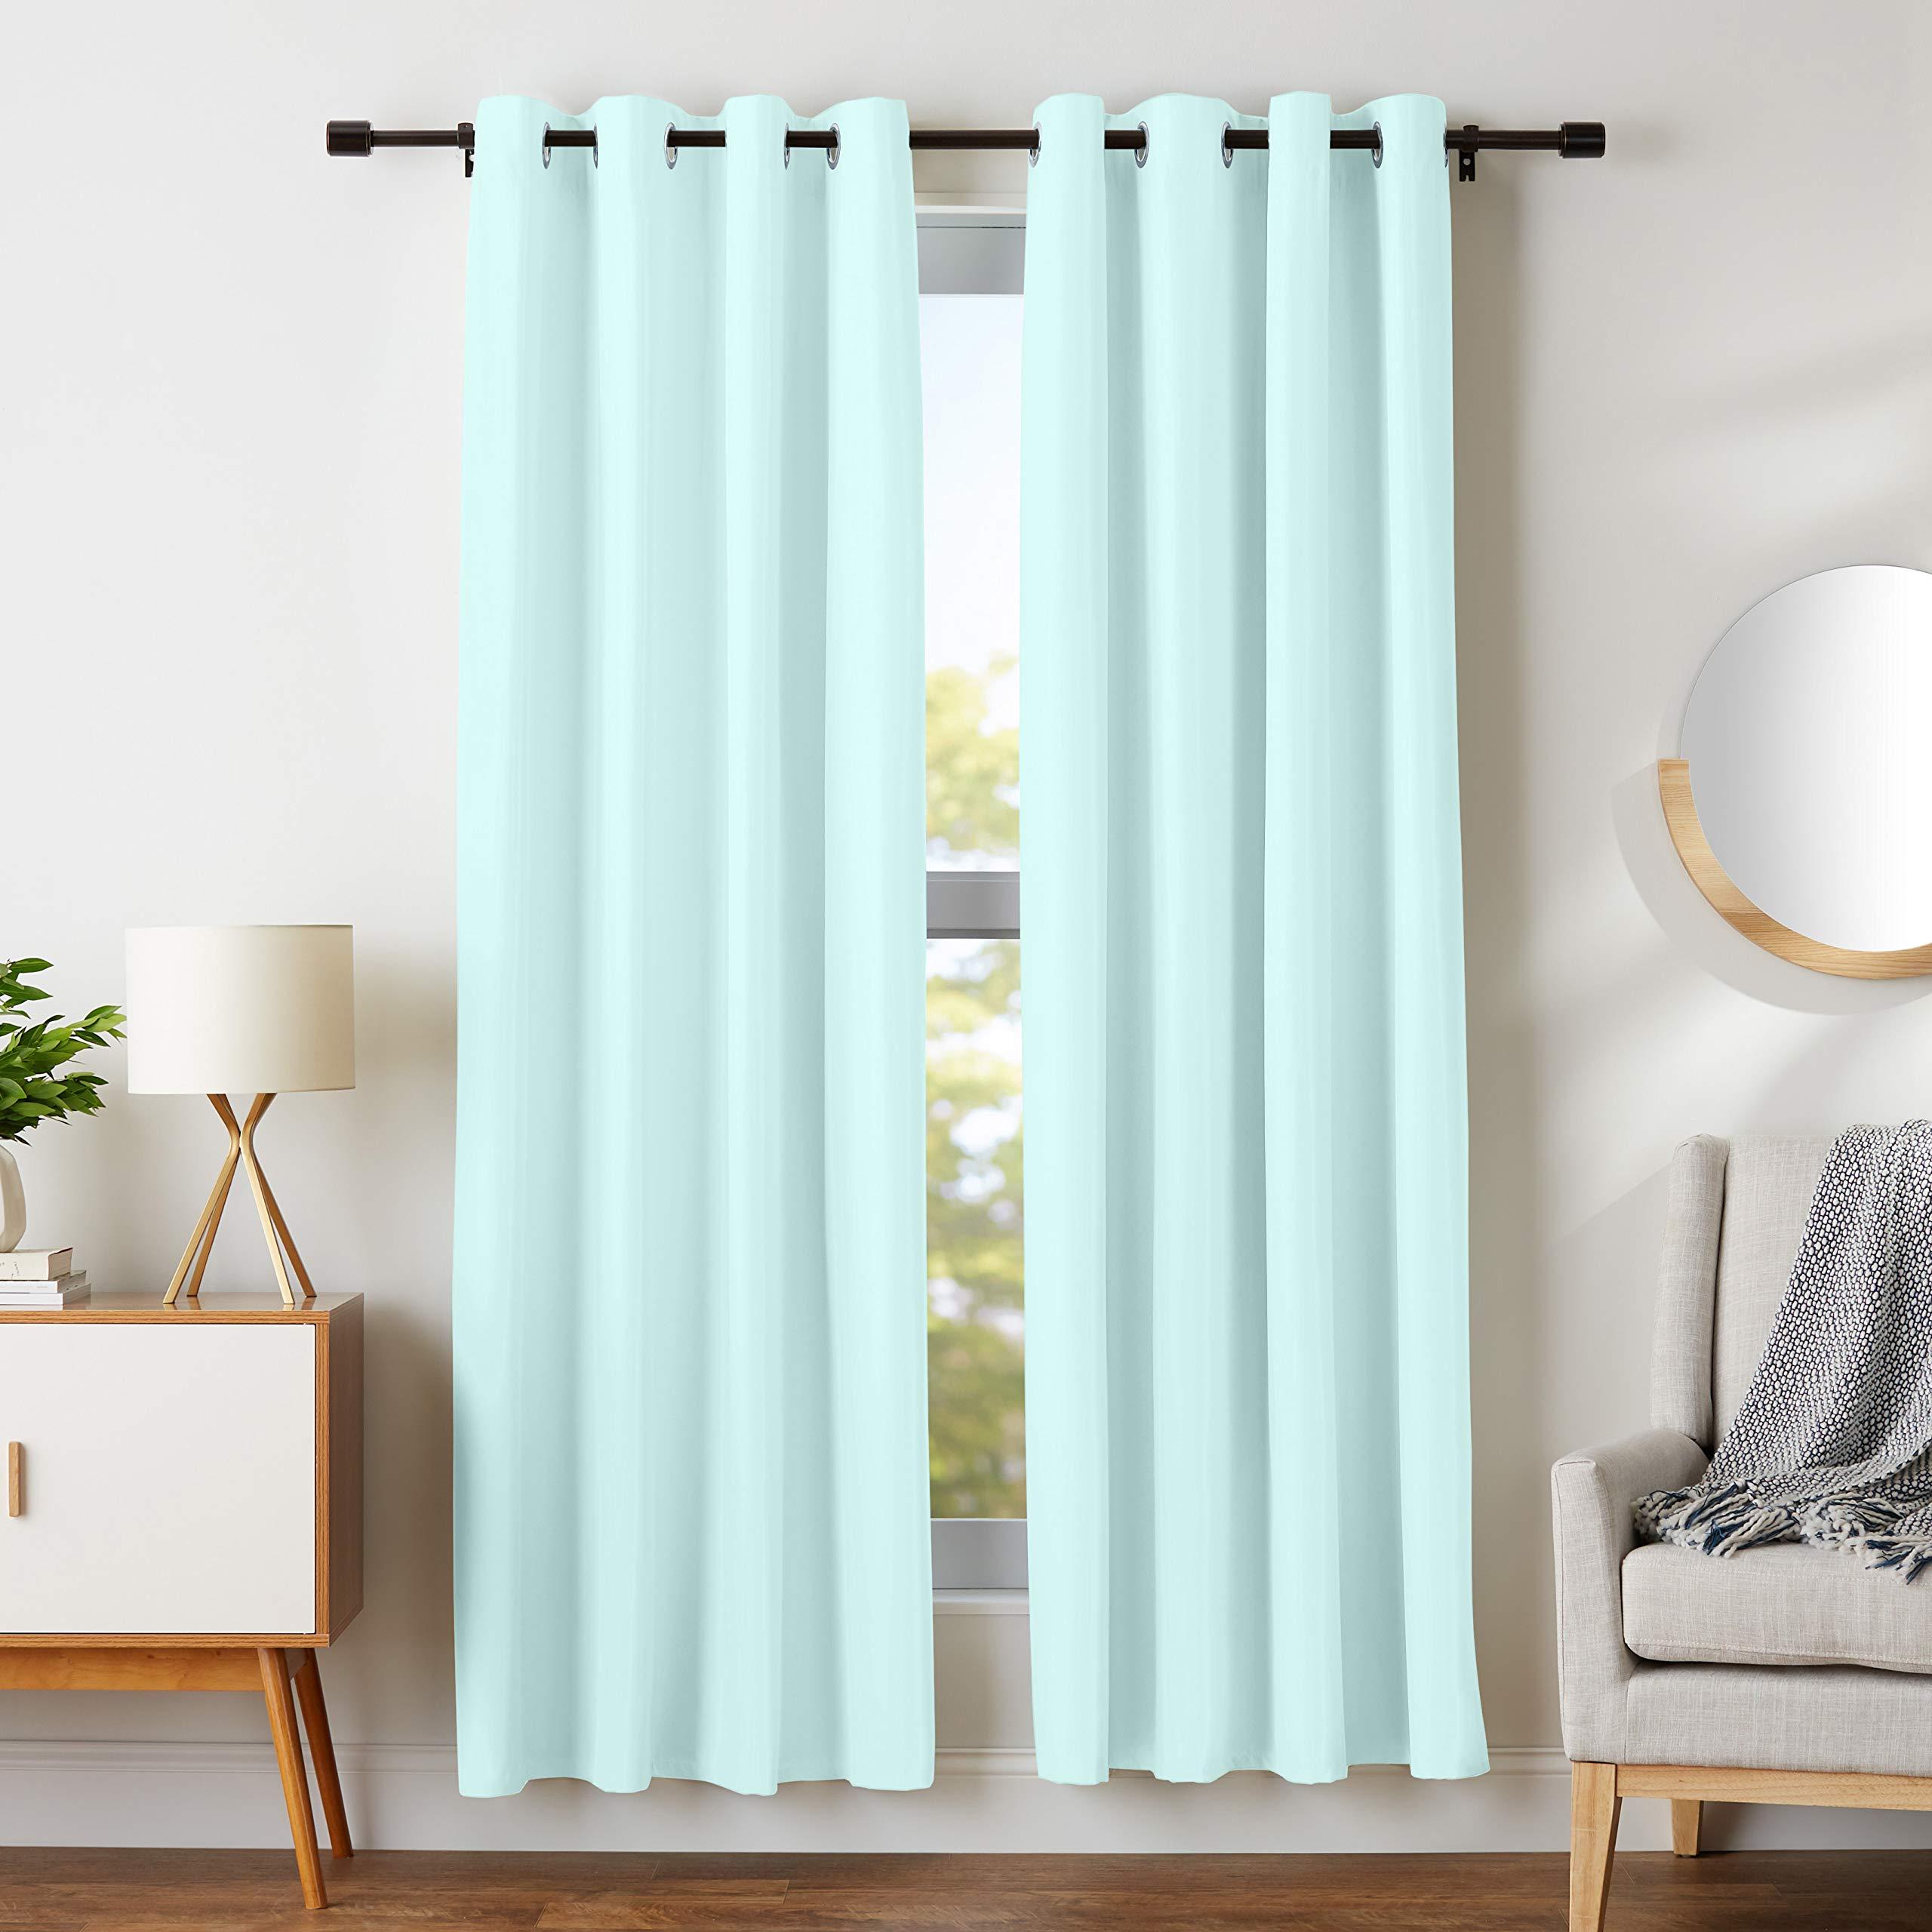 AmazonBasics Room Darkening Blackout Window Curtains with Grommets - 42 x 84, Seafoam Green, 2 Panels